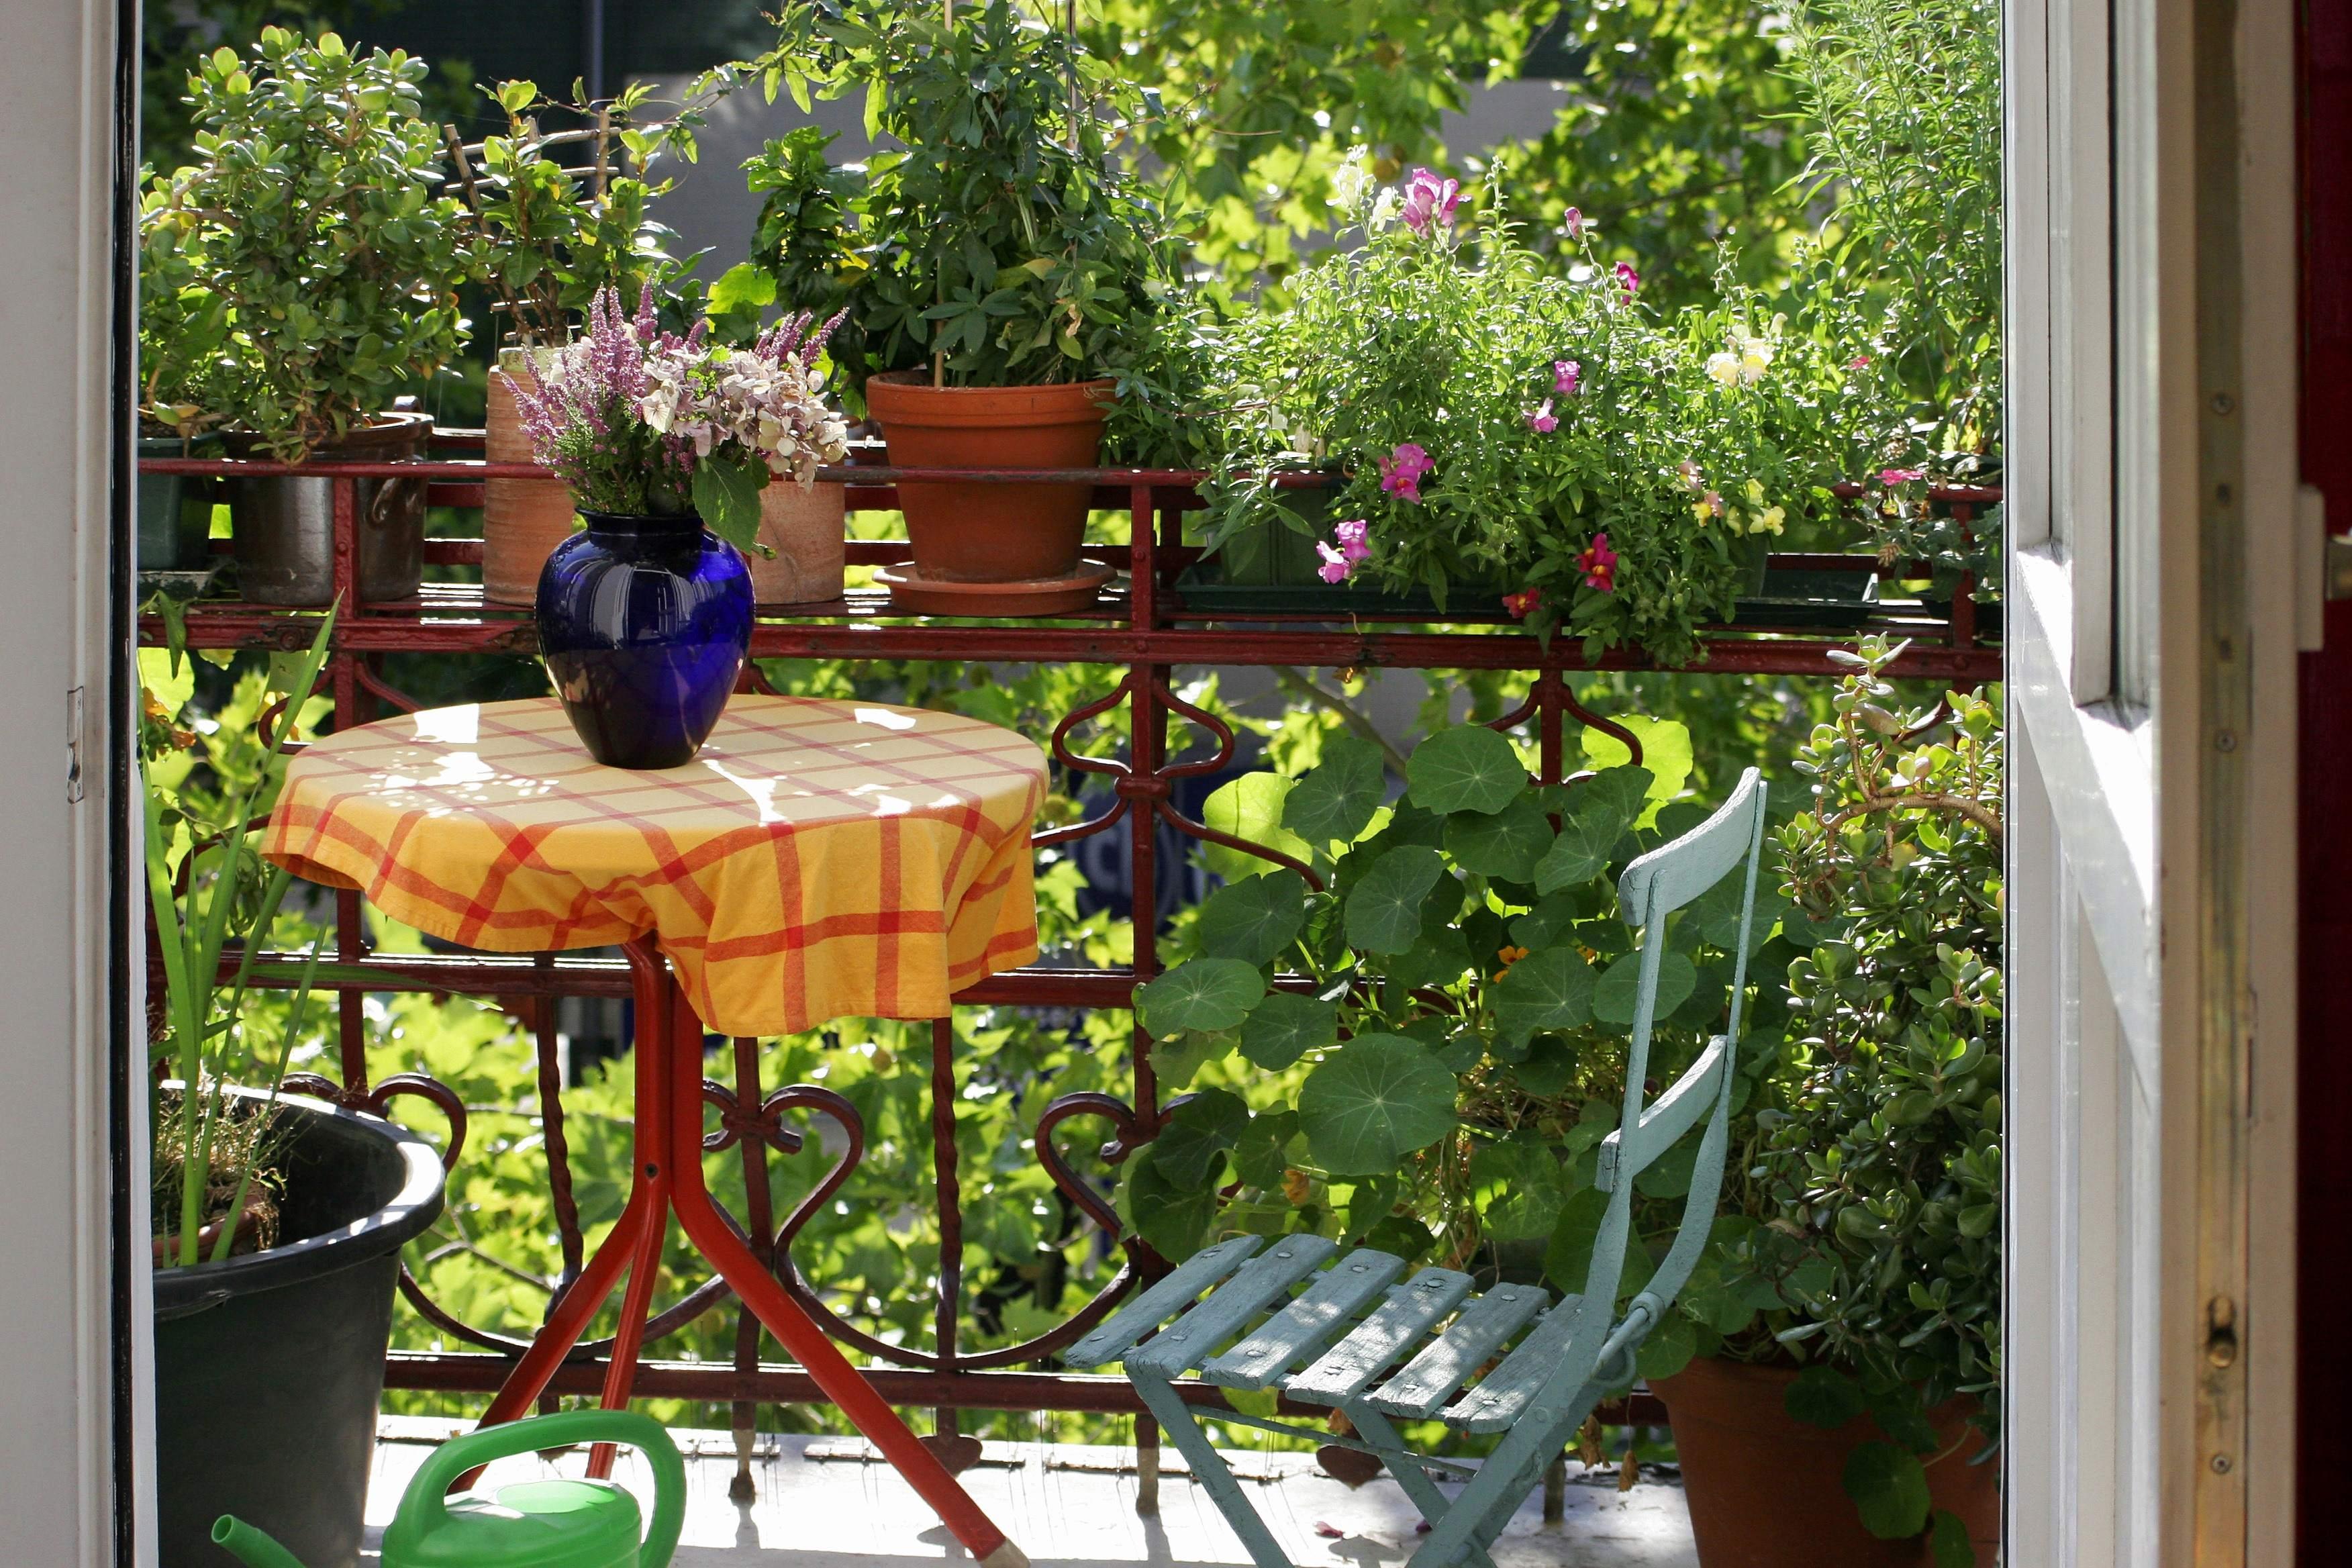 Le Jardin Des Sens Hennebont Beau Images 13 Magnifique Jardin Des Sens Hennebont Galerie De Cuisine Jardin